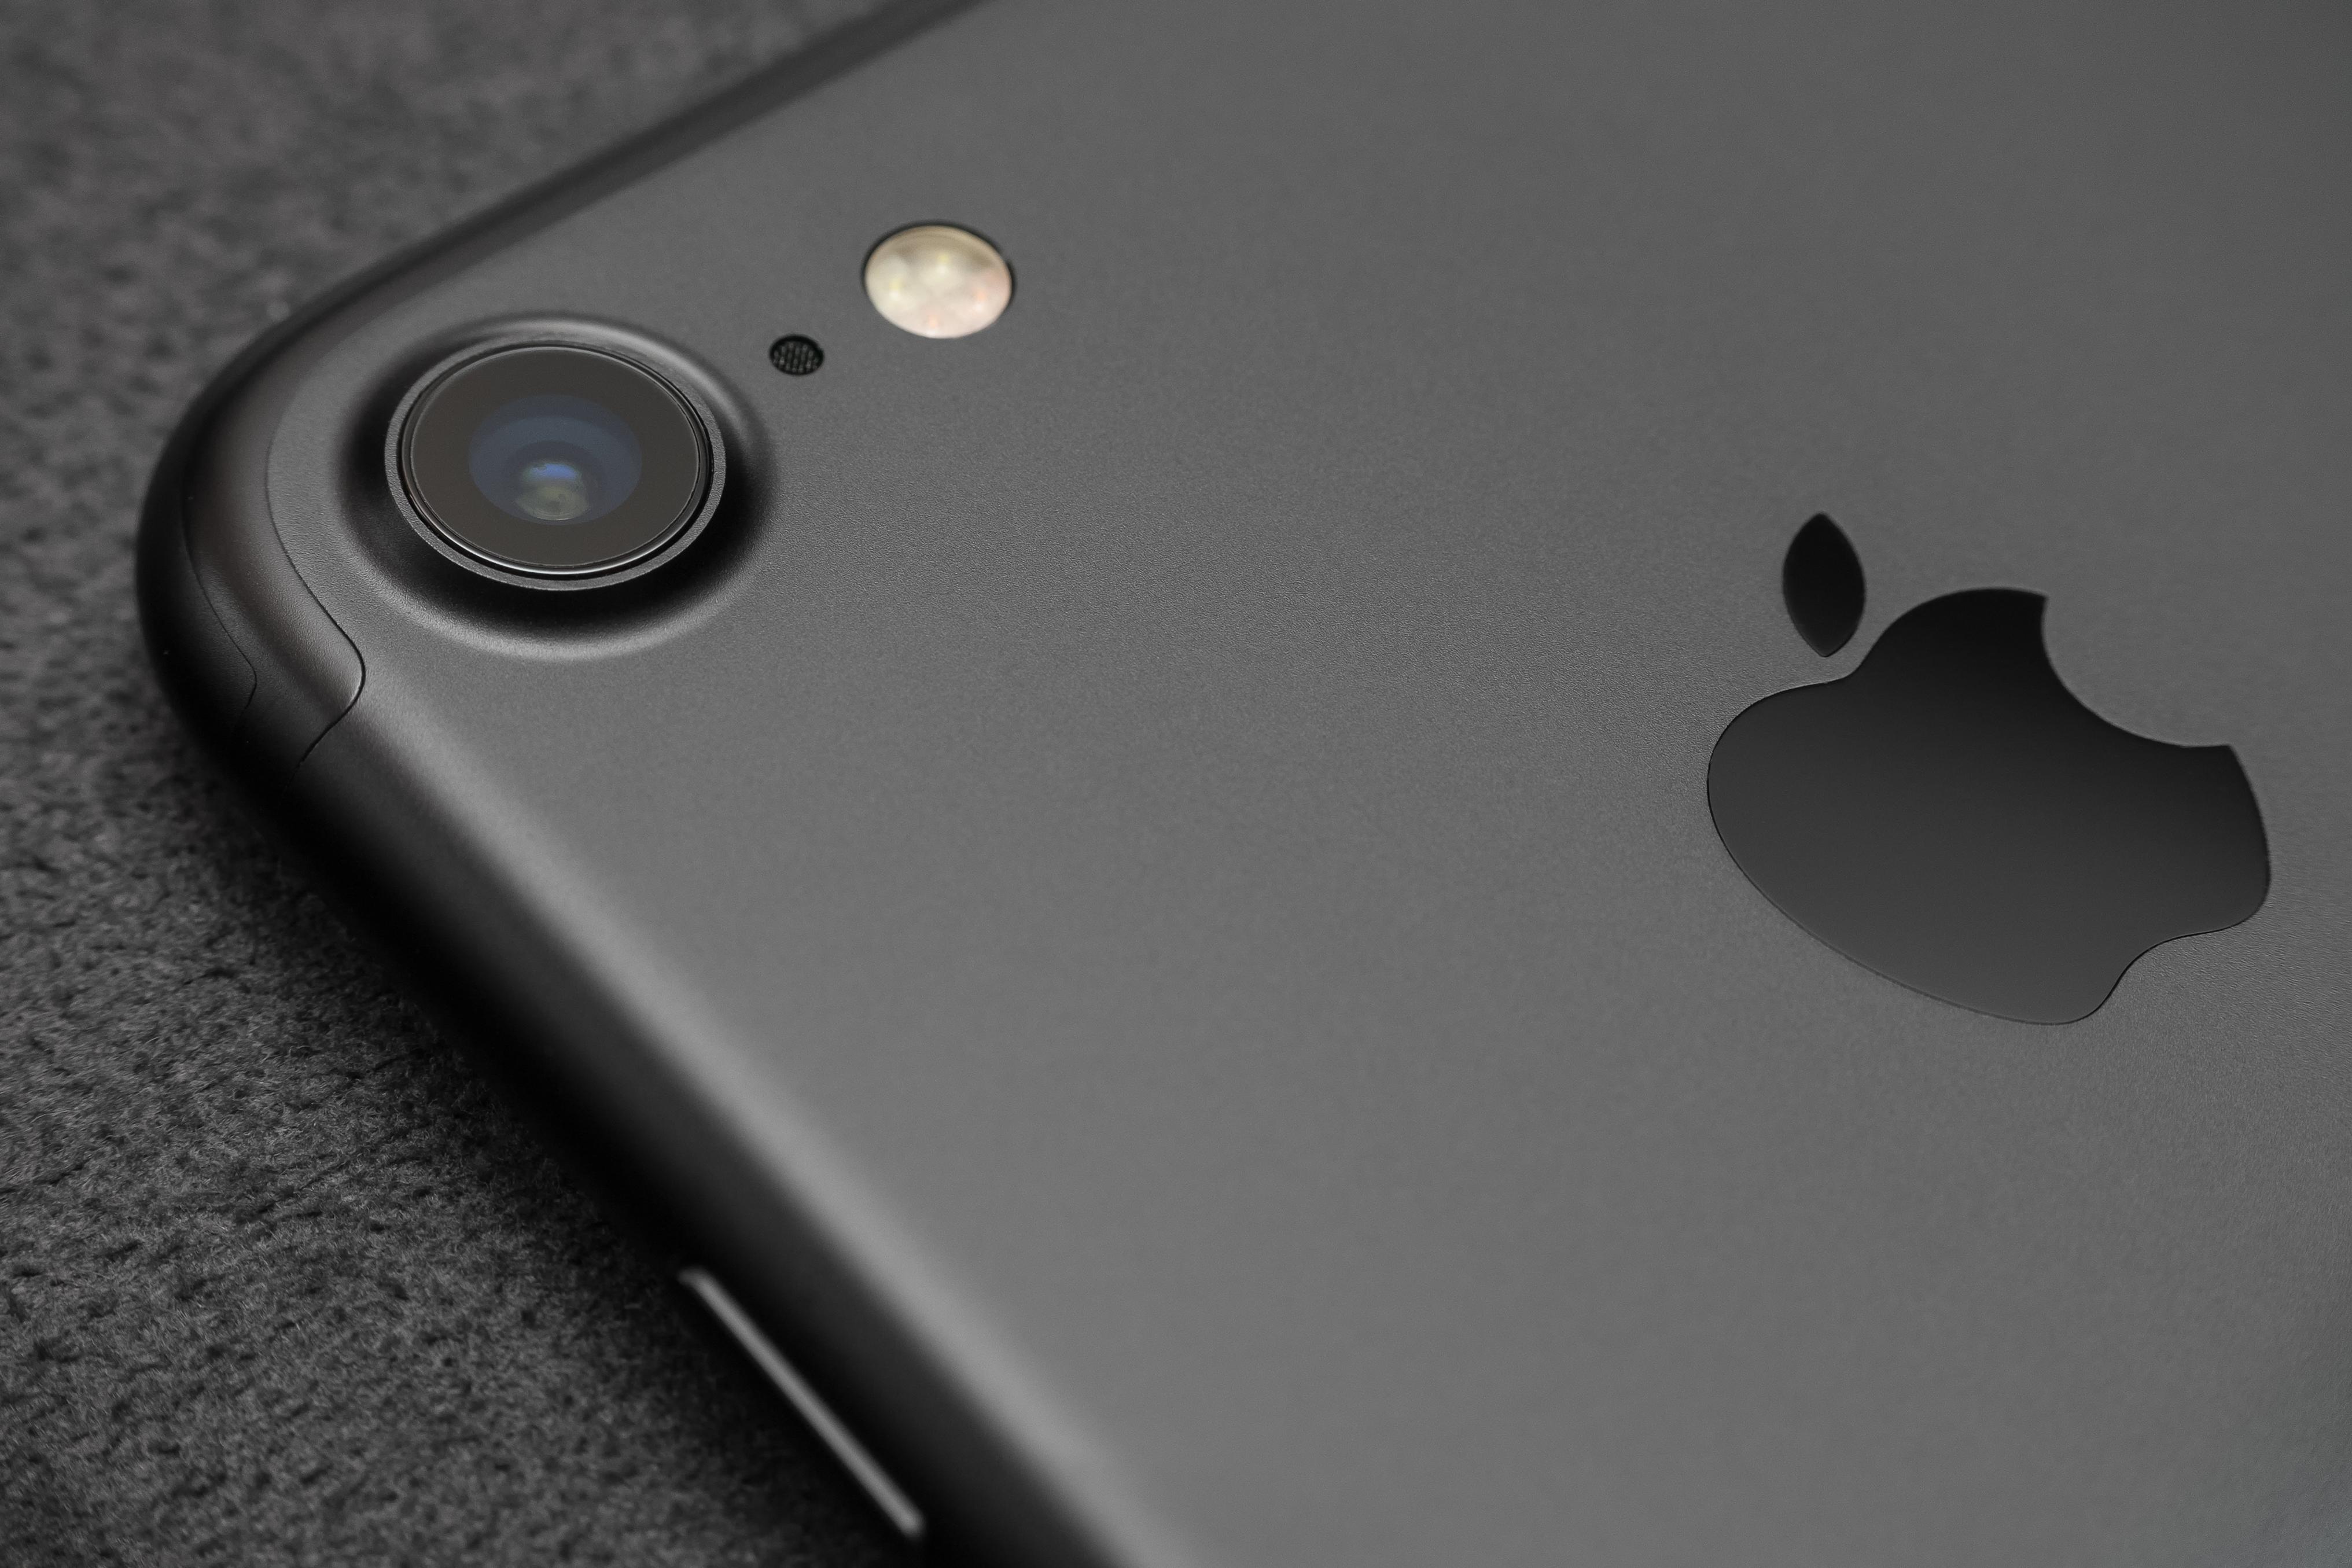 Close up camera lens view iPhone 7 black color